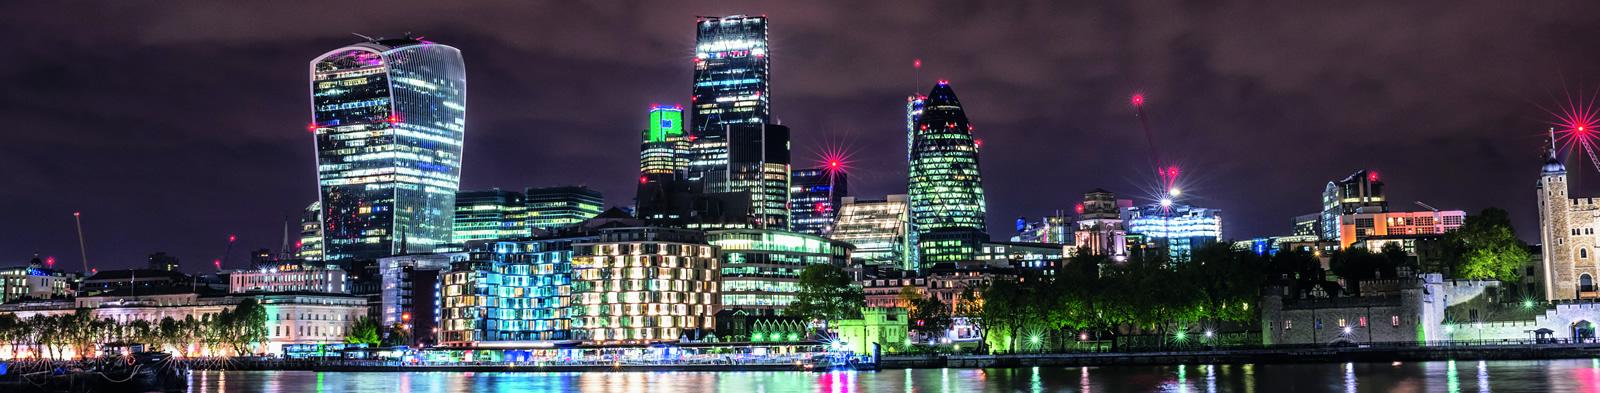 City of London illuminated